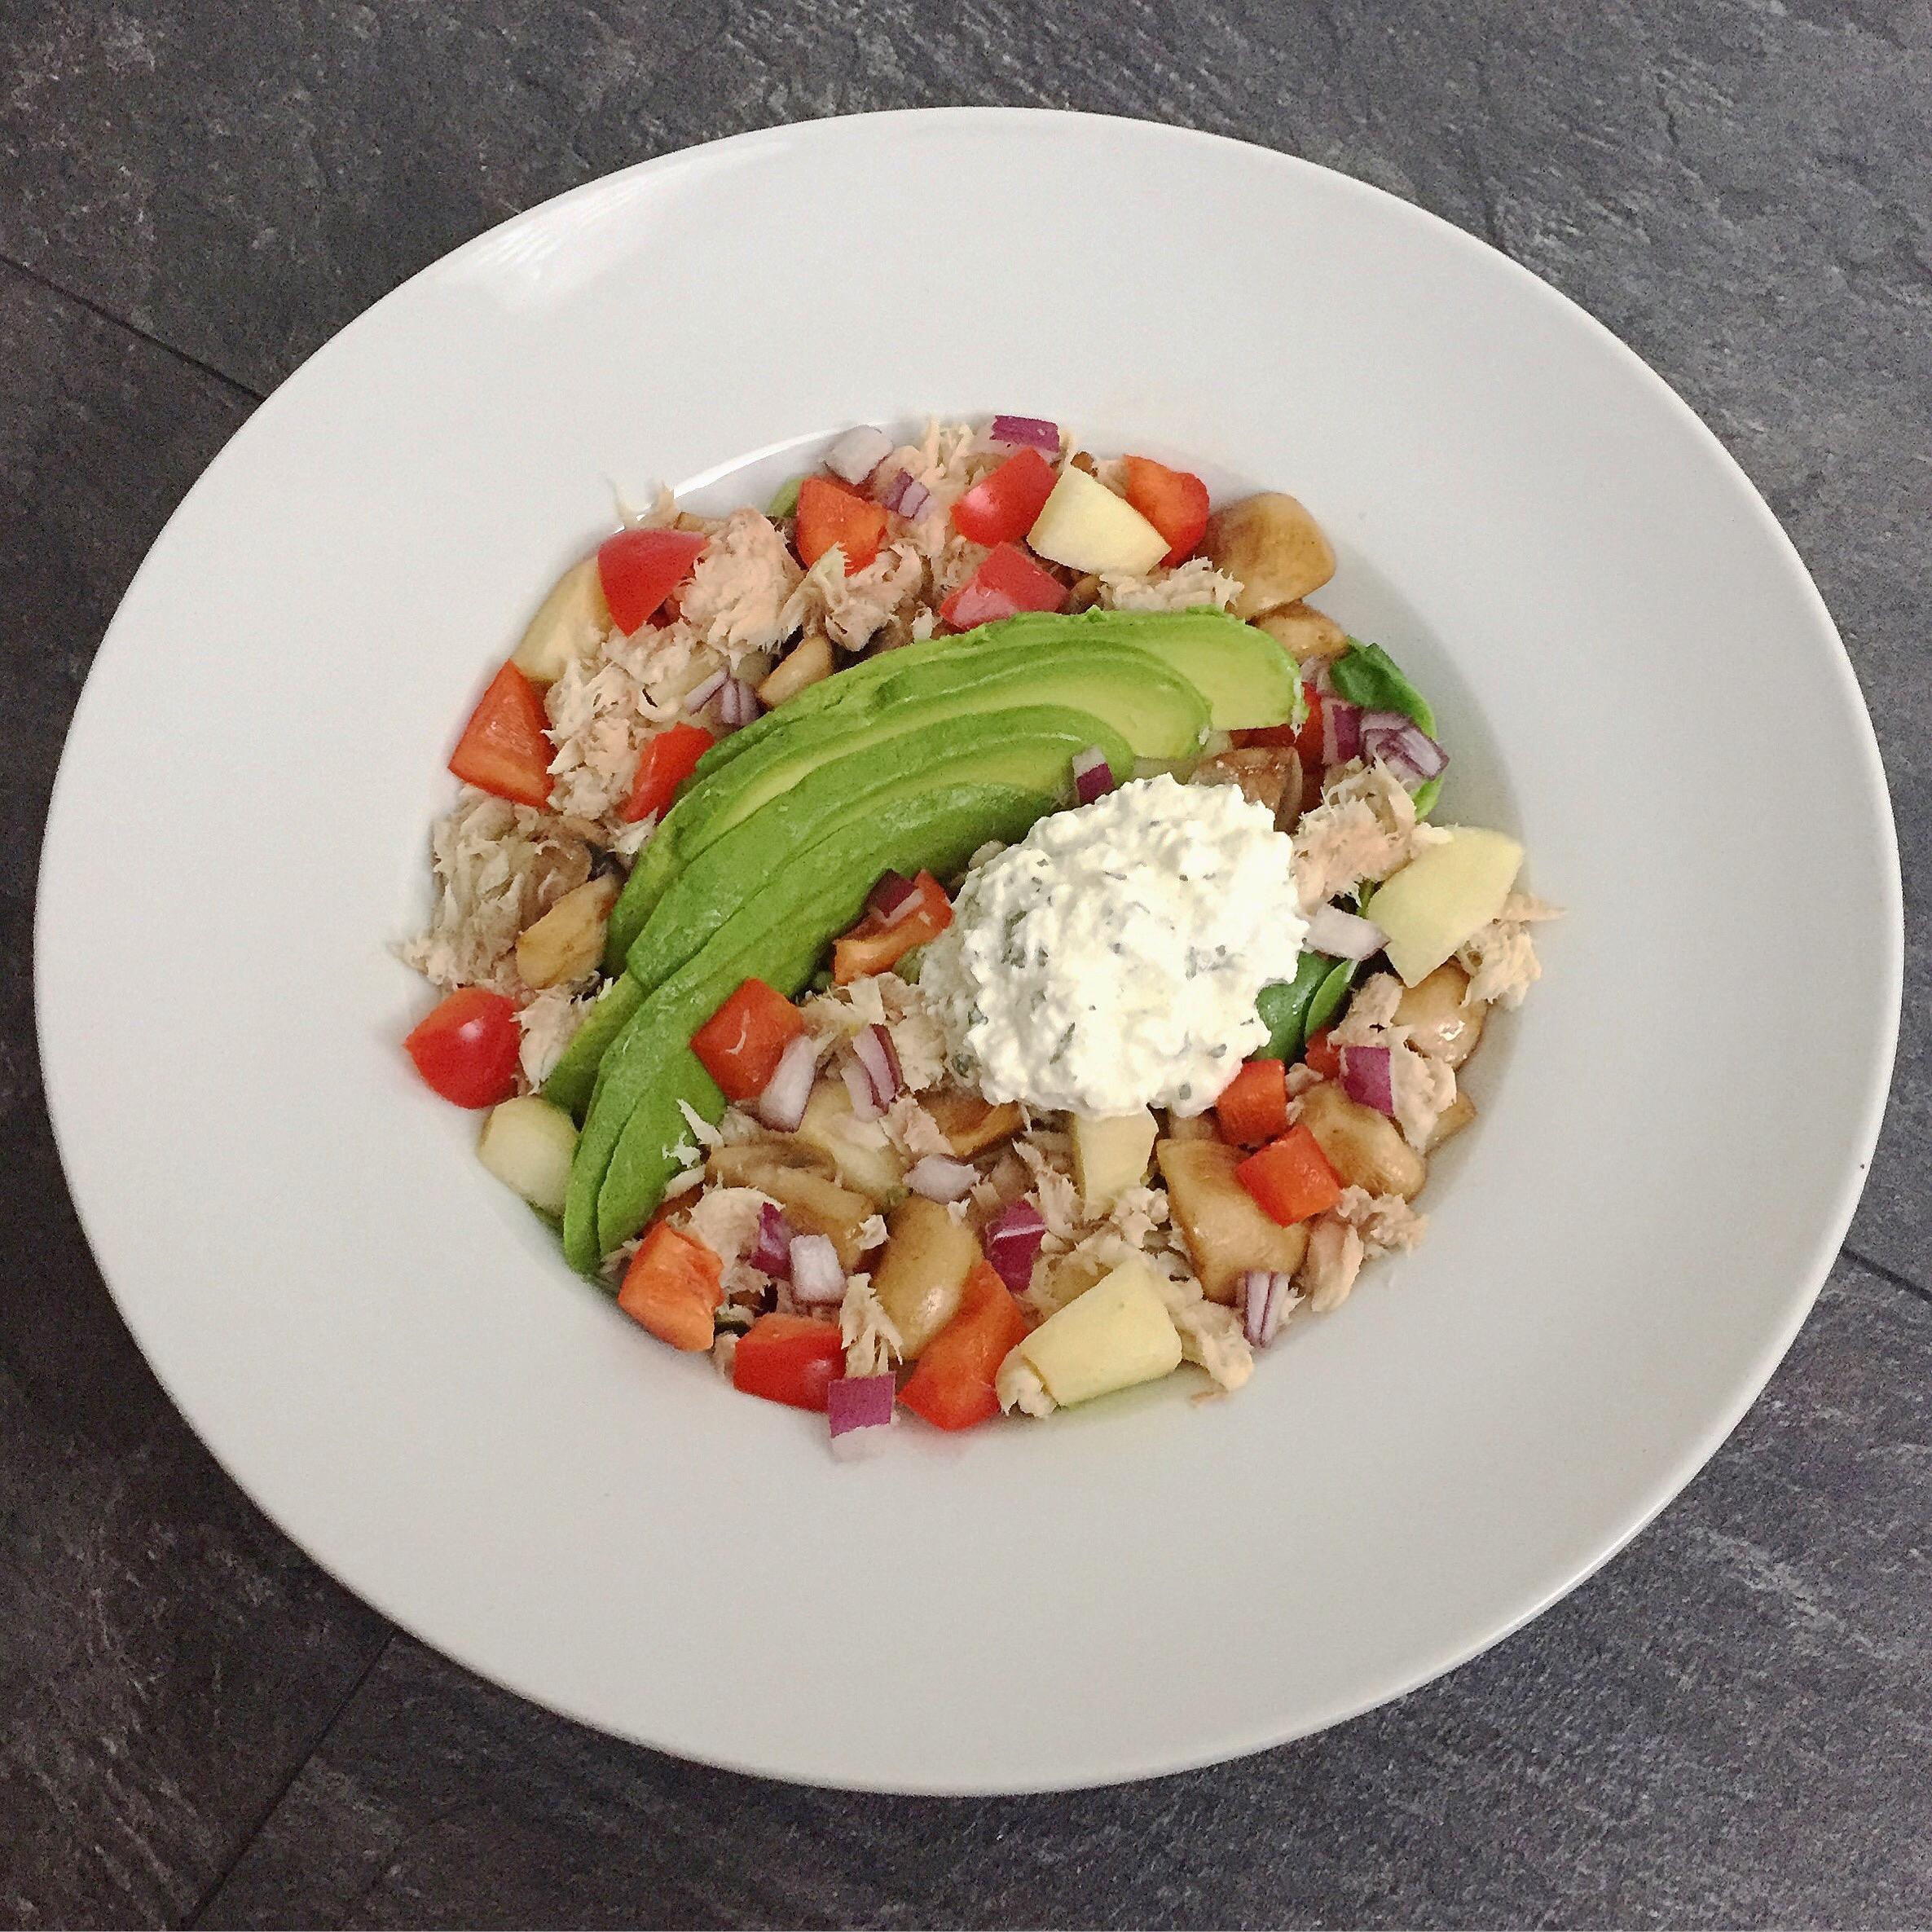 salade met gerookte makreel